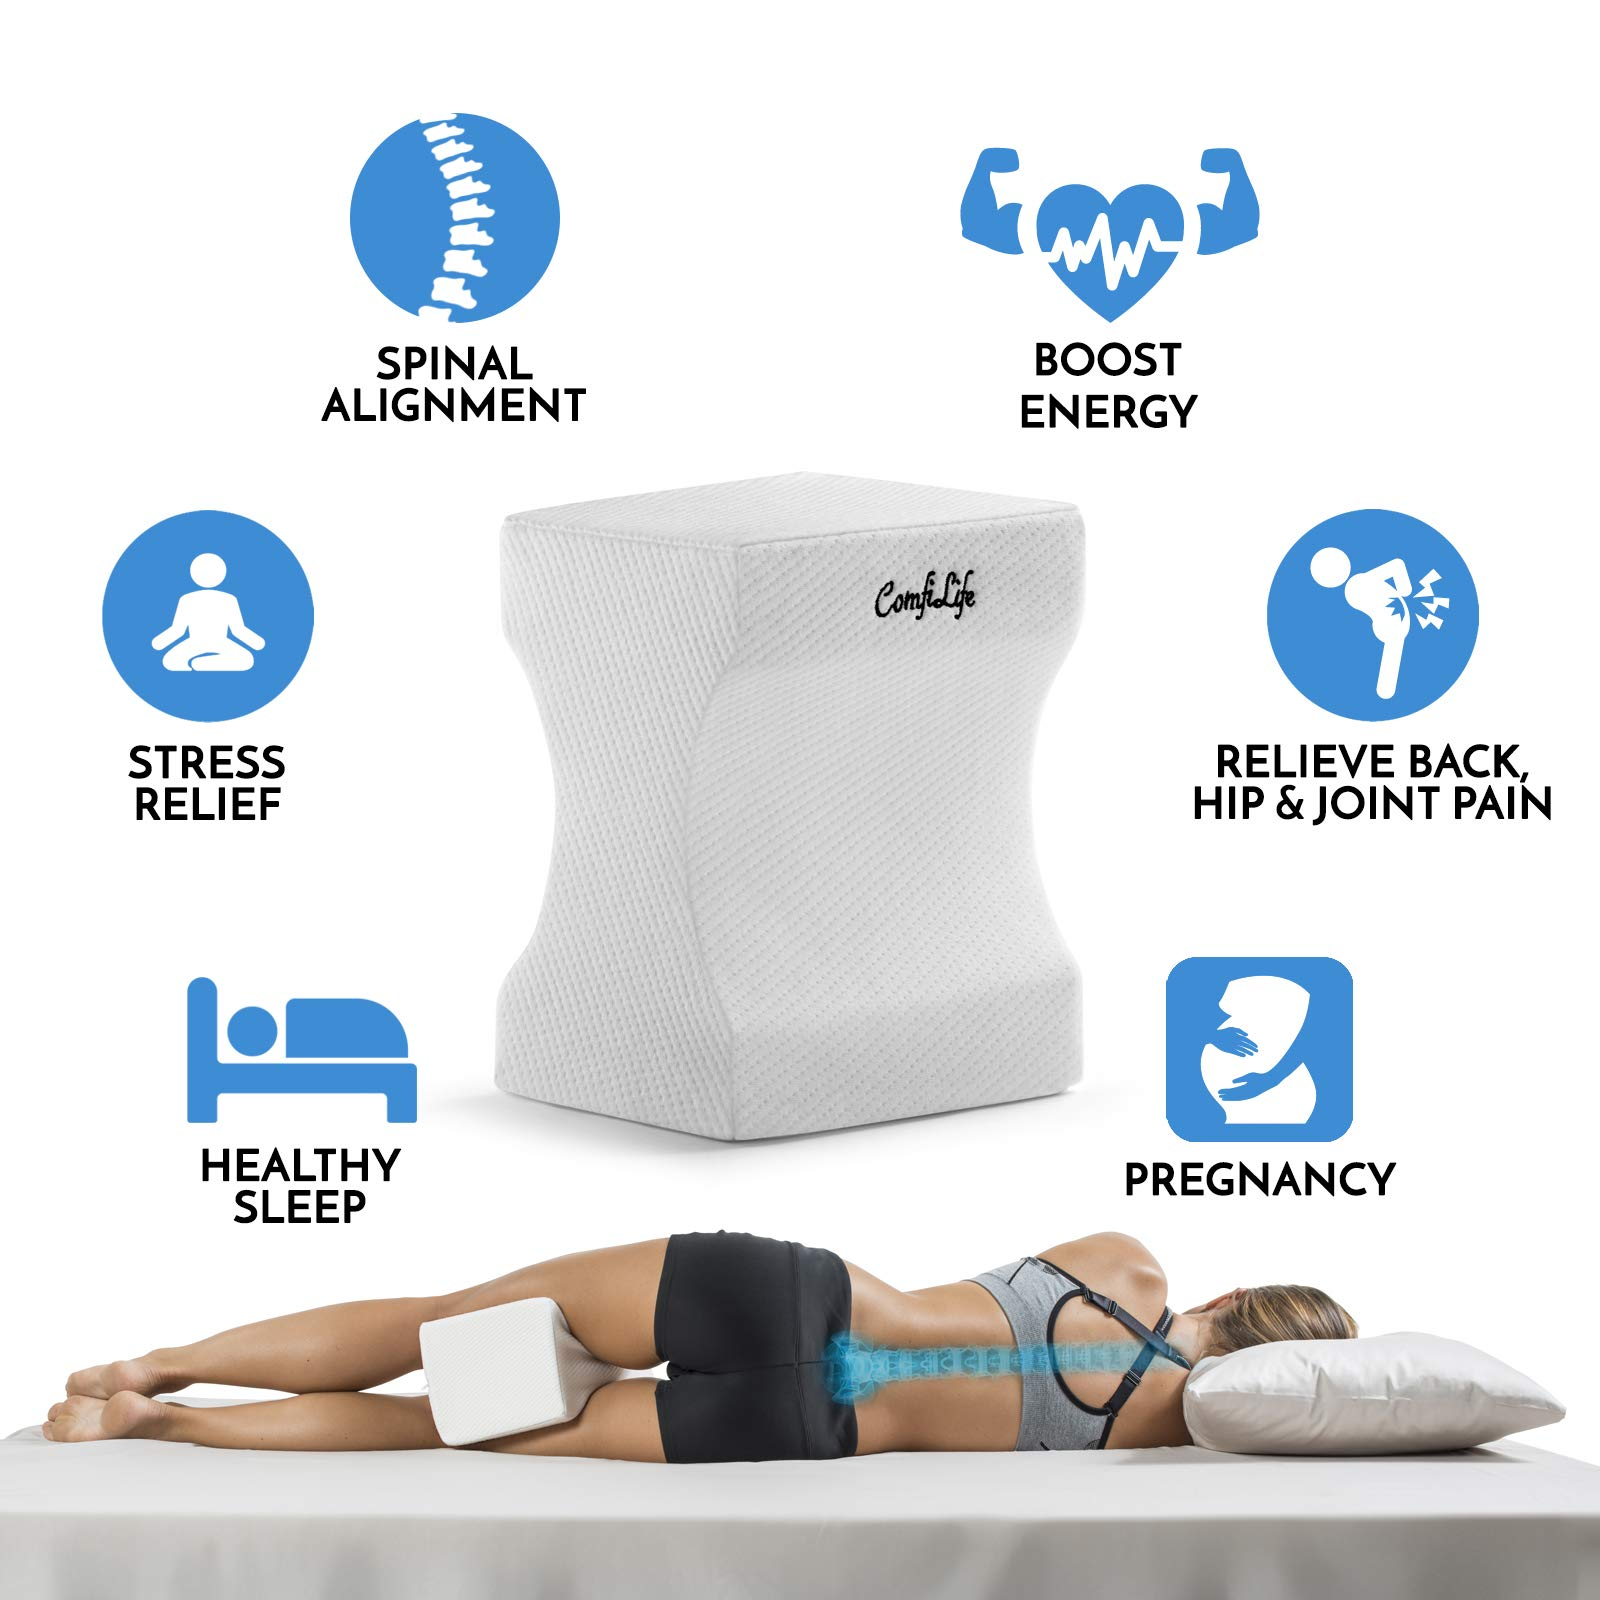 Comfilife Orthopedic Knee Pillow For Sciatica Relief Back